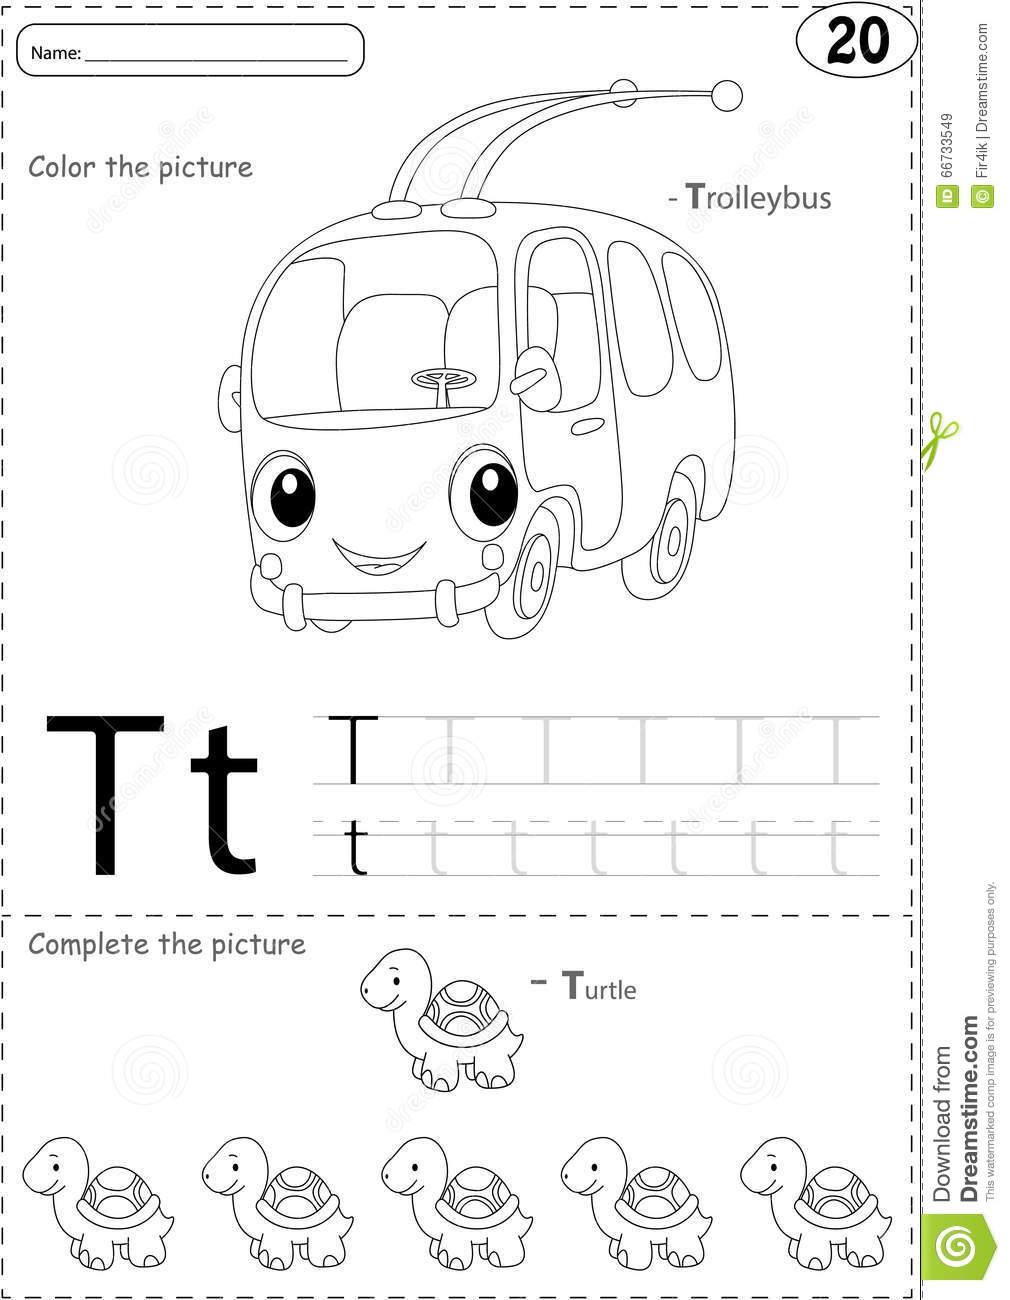 Reading Worskheets: English Grammar Exercises For Ilse within Multiplication Worksheets Ks4